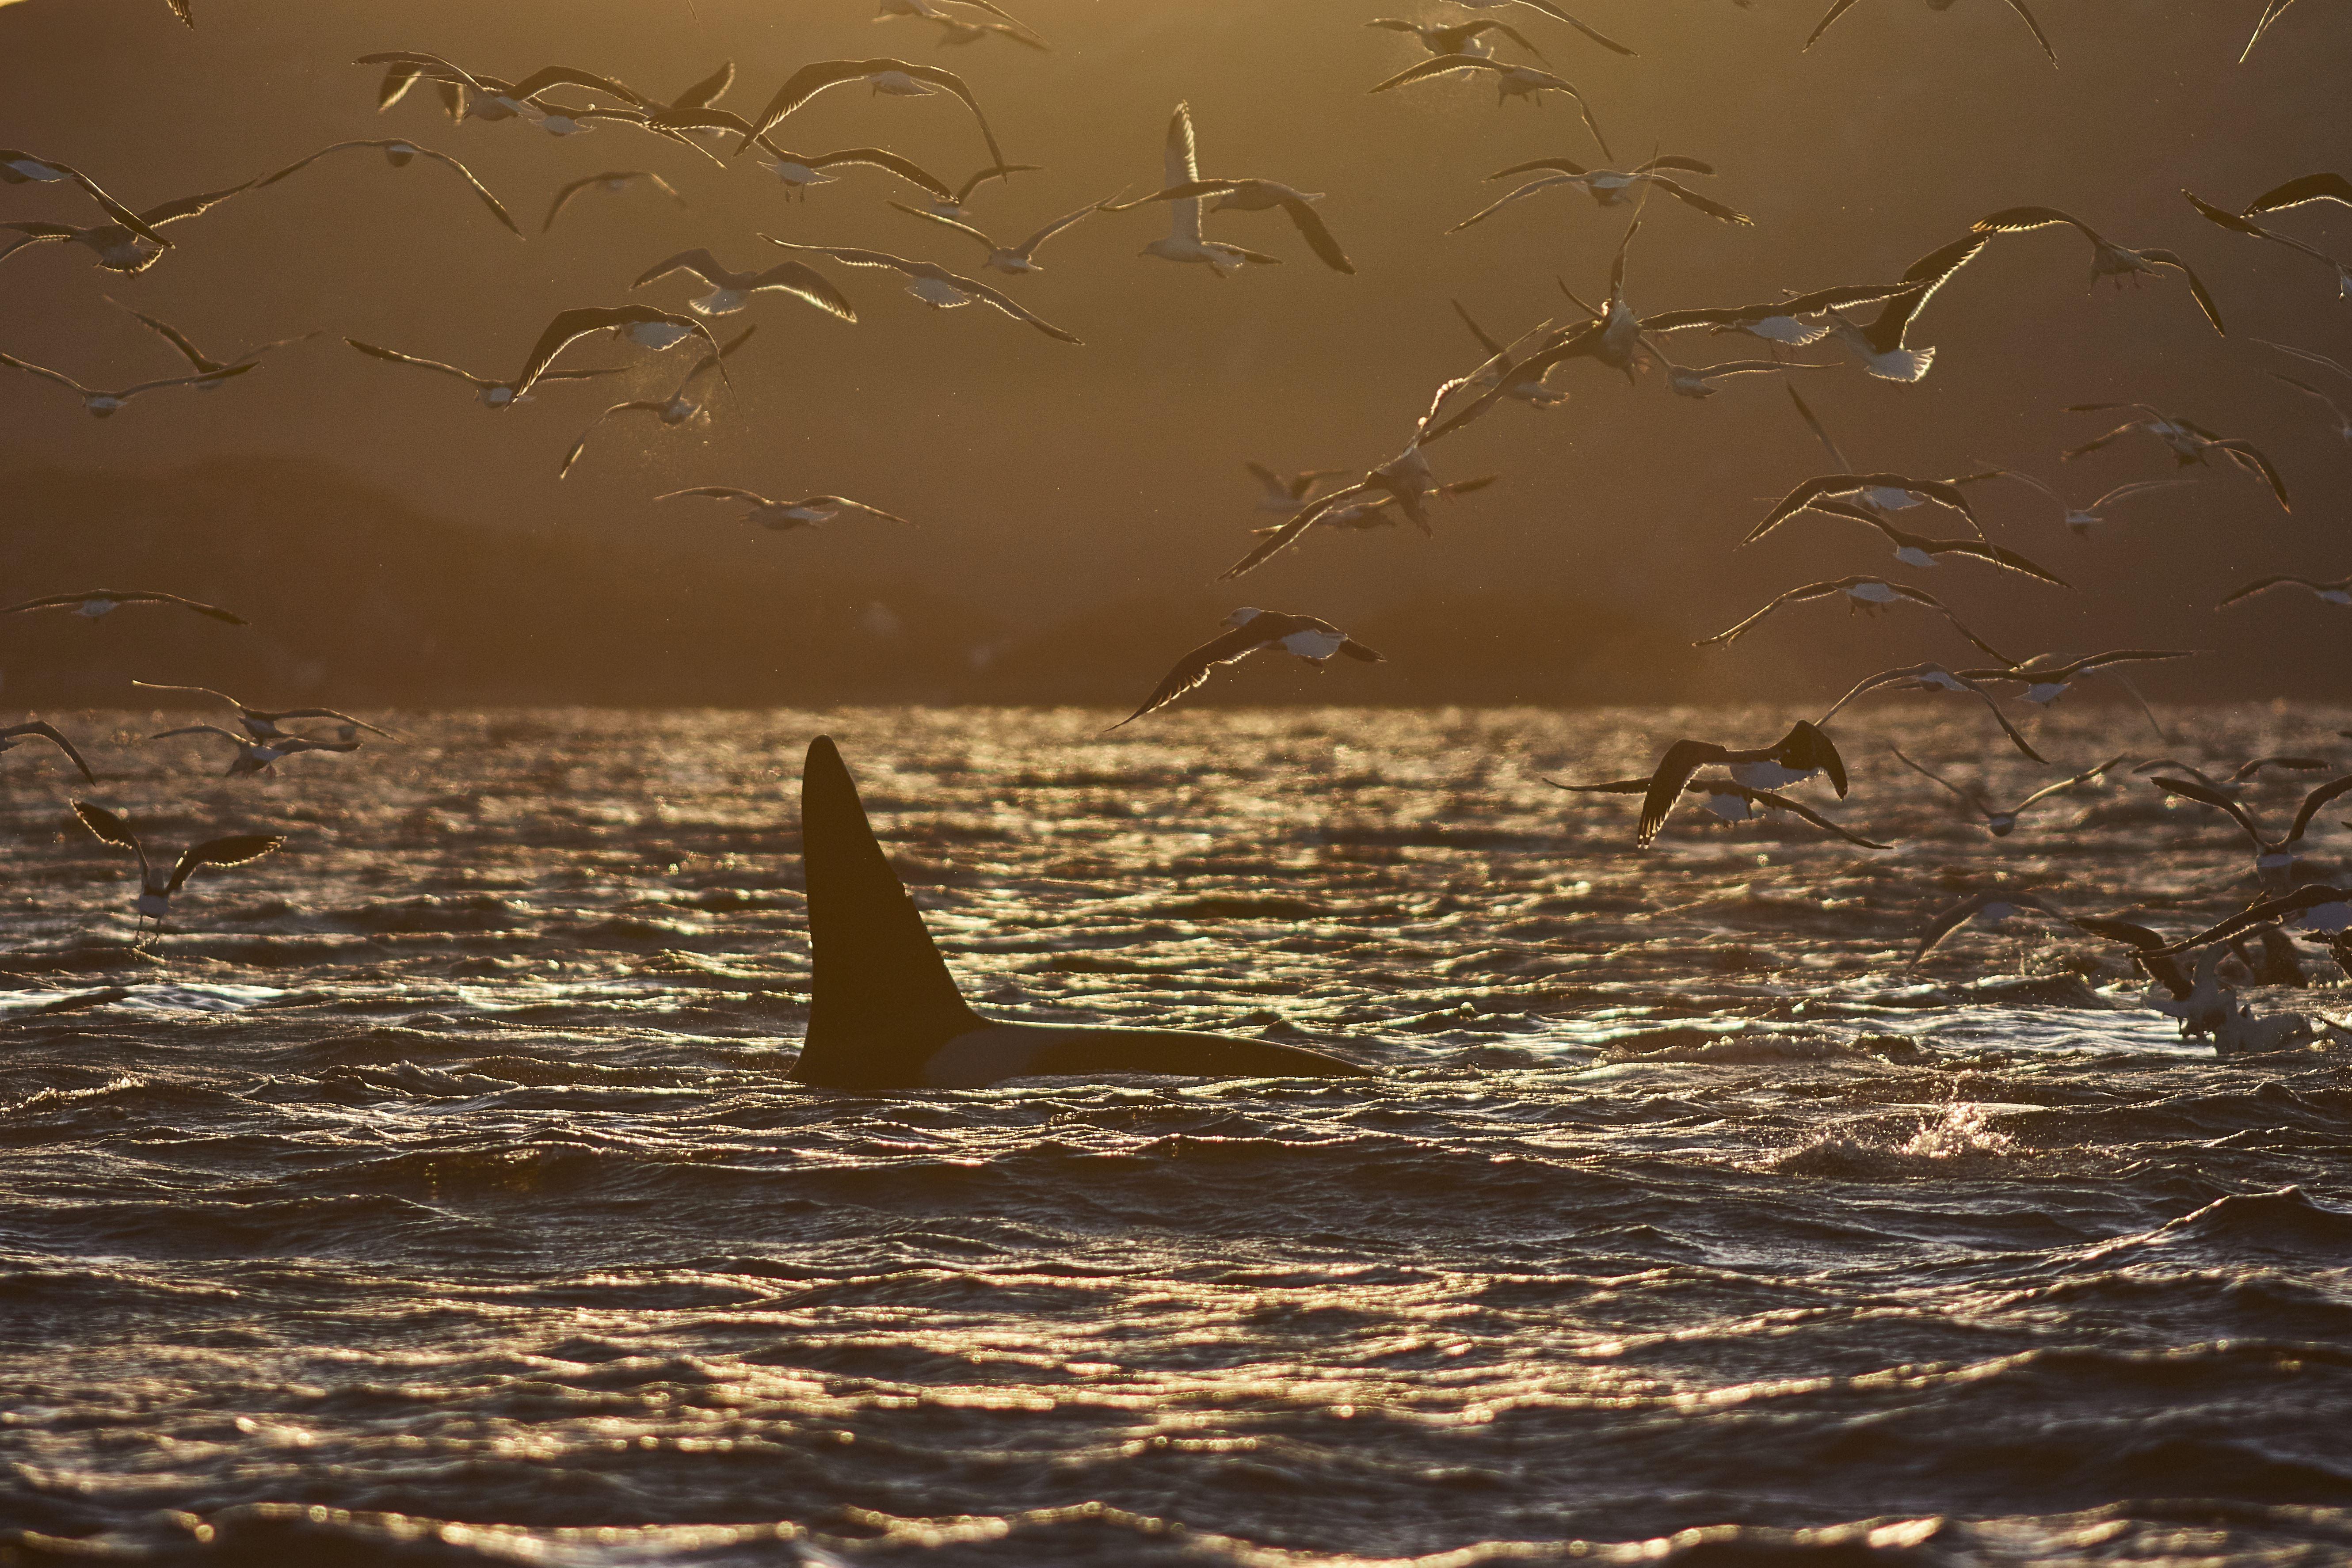 Midnight Sun photo safari by RIB - Green Gold of Norway